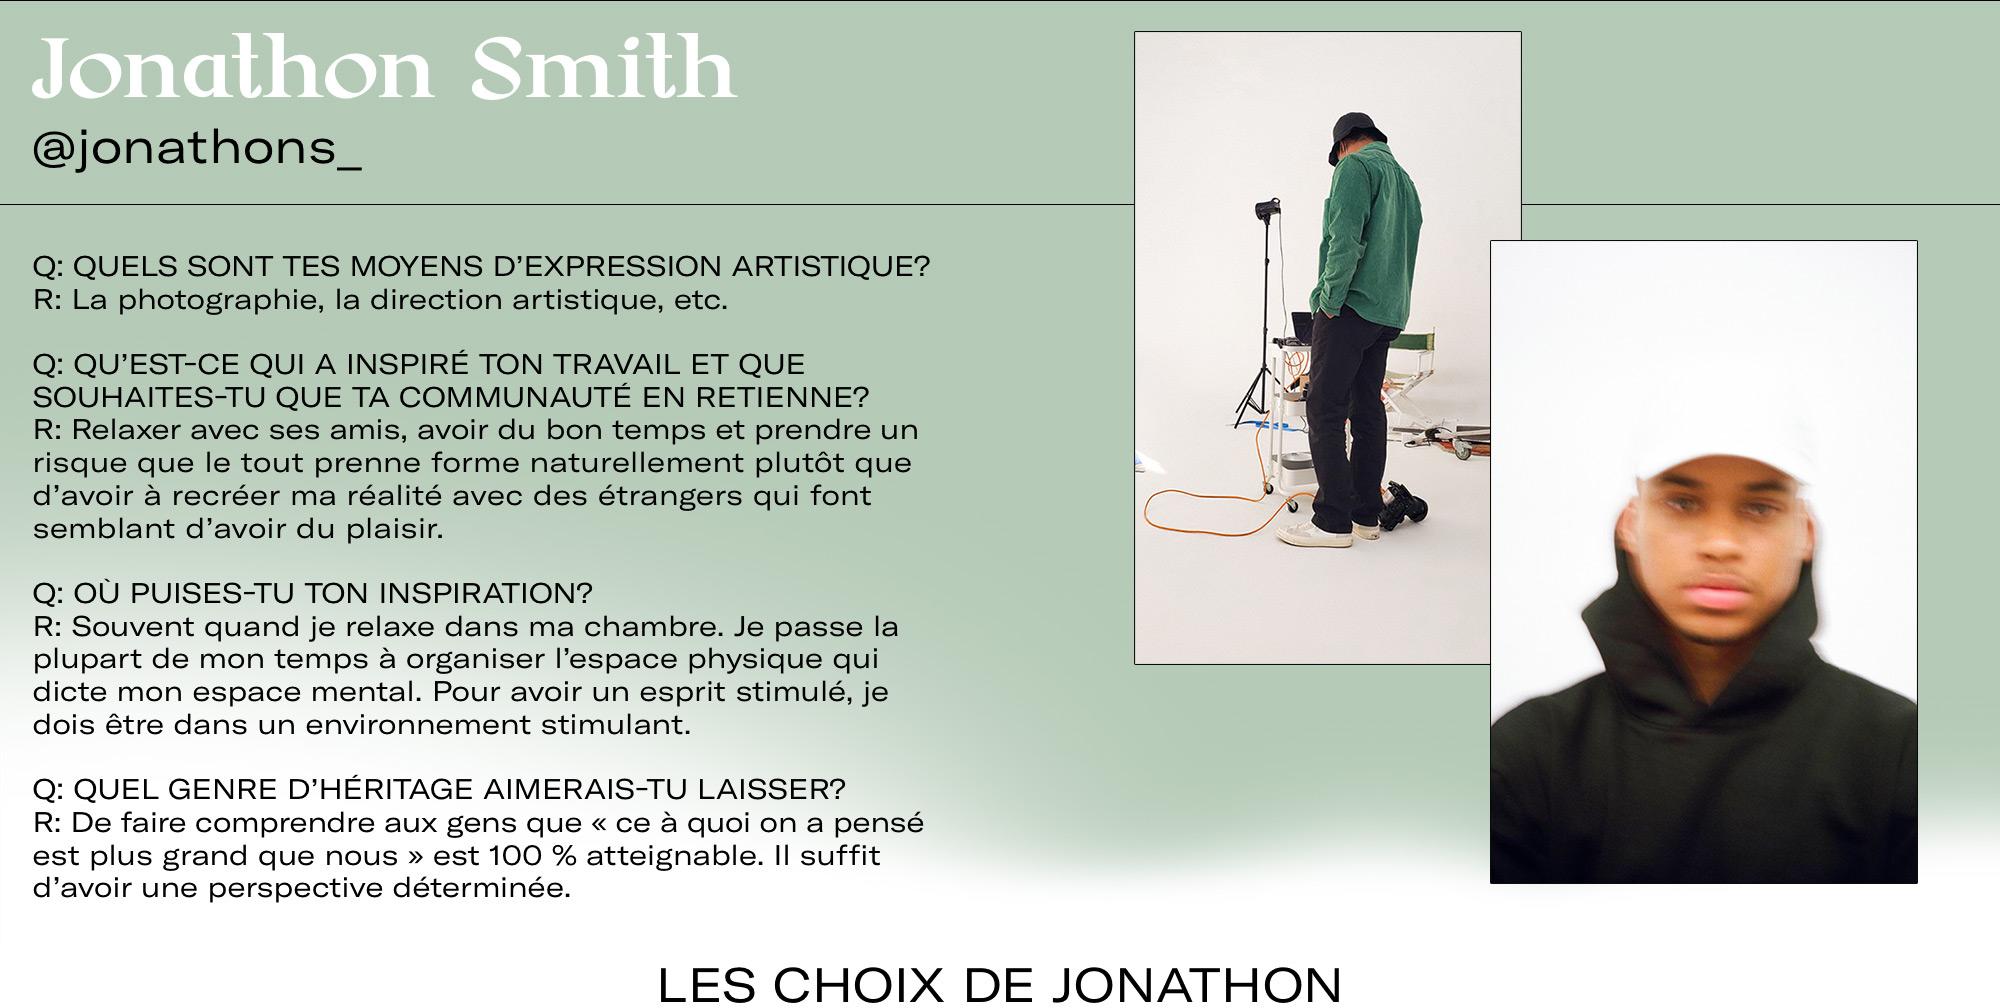 Jonathon Smith Q&A